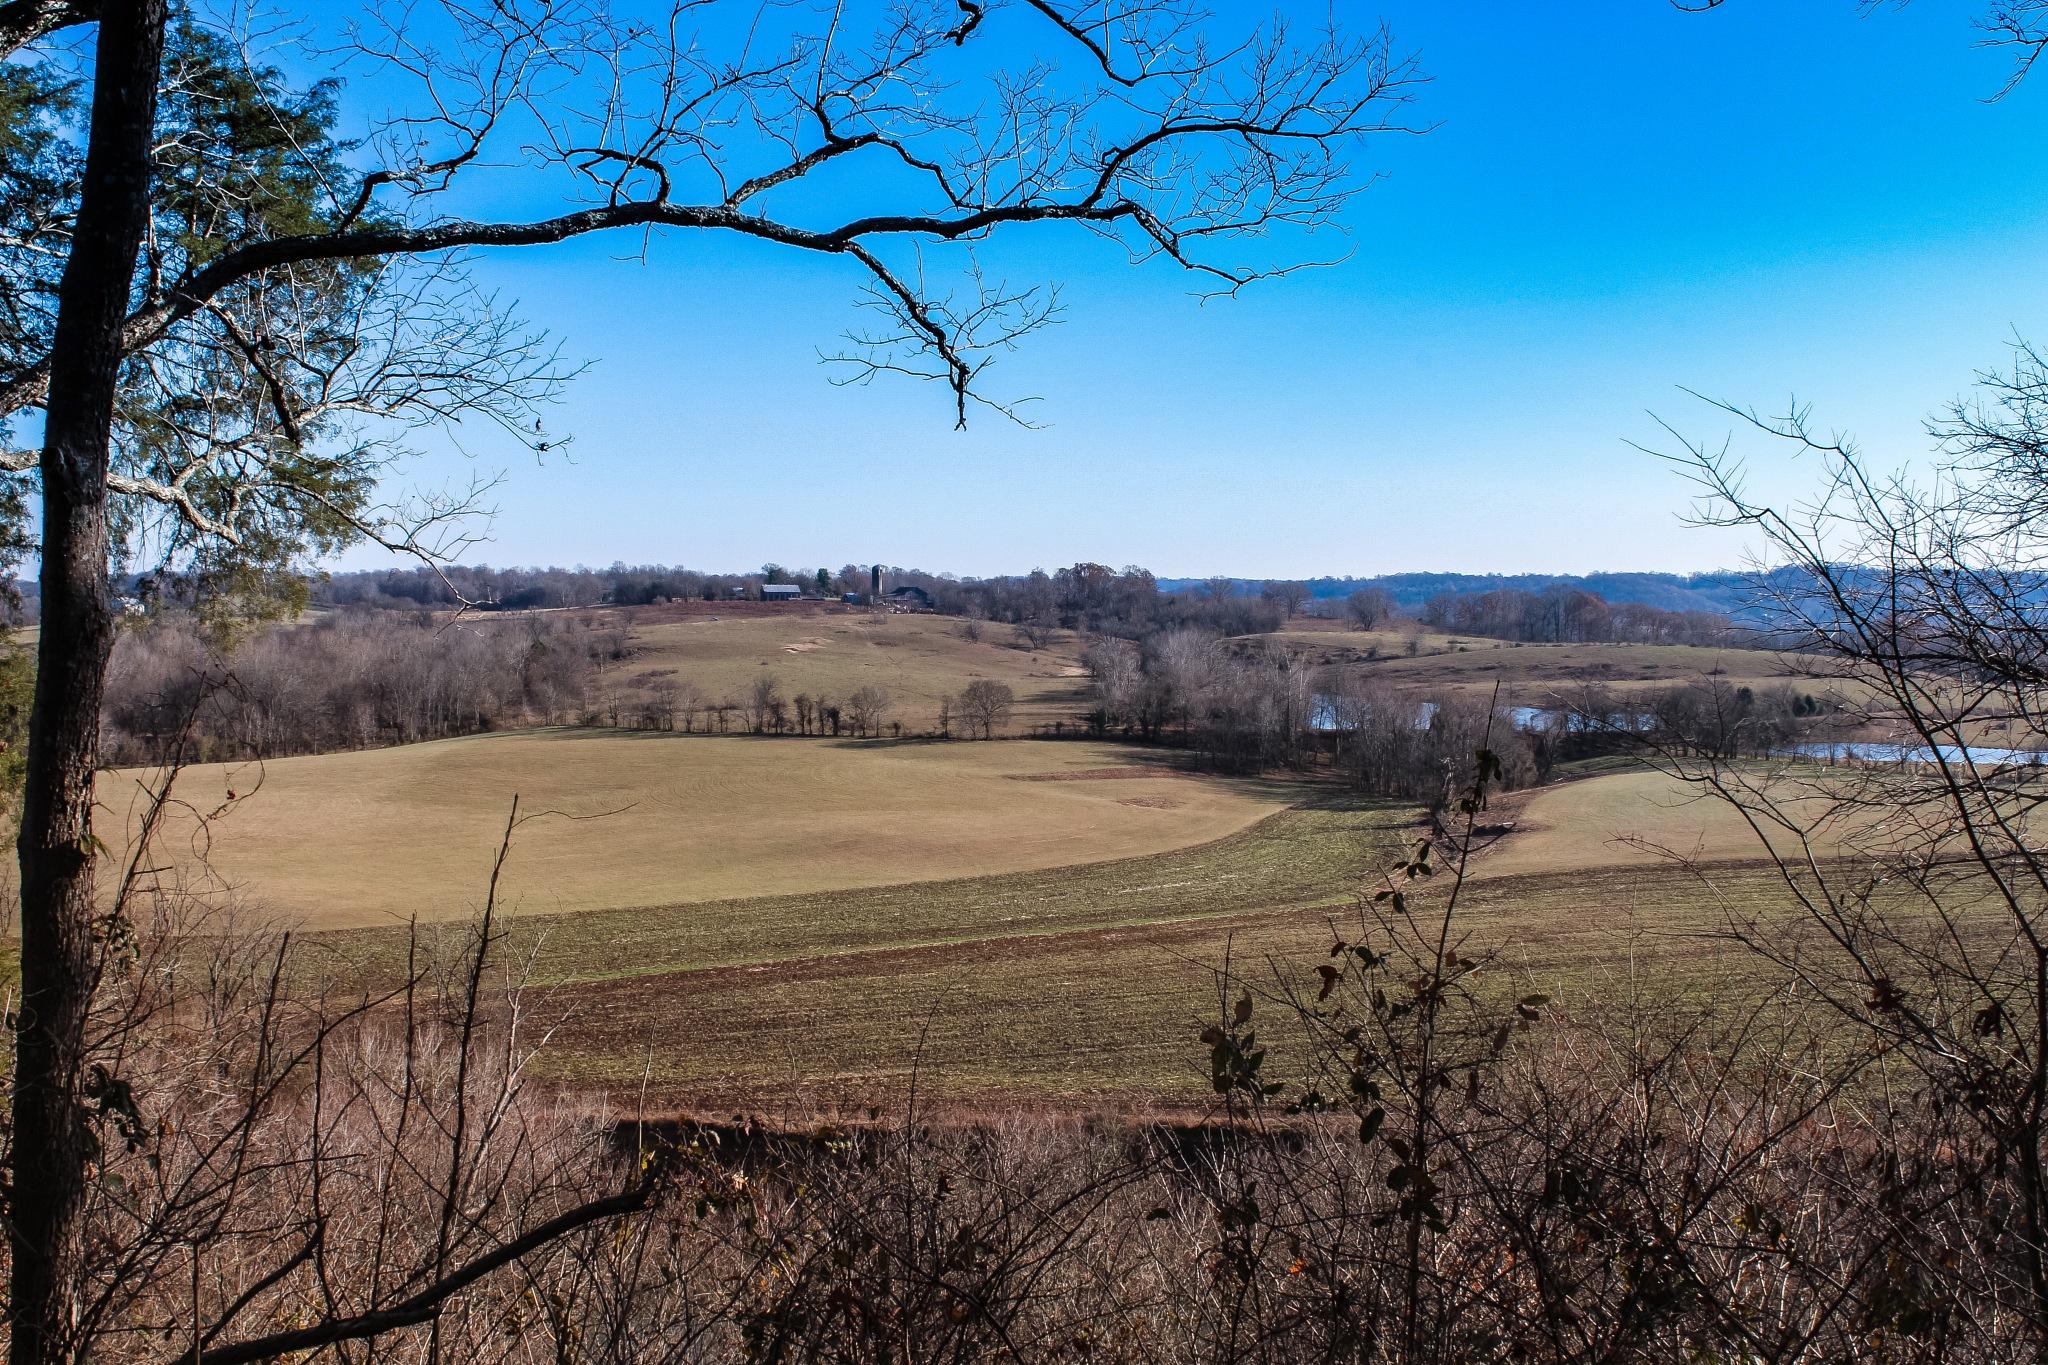 Fall on the Natchez Trace by Scott F. Brooks